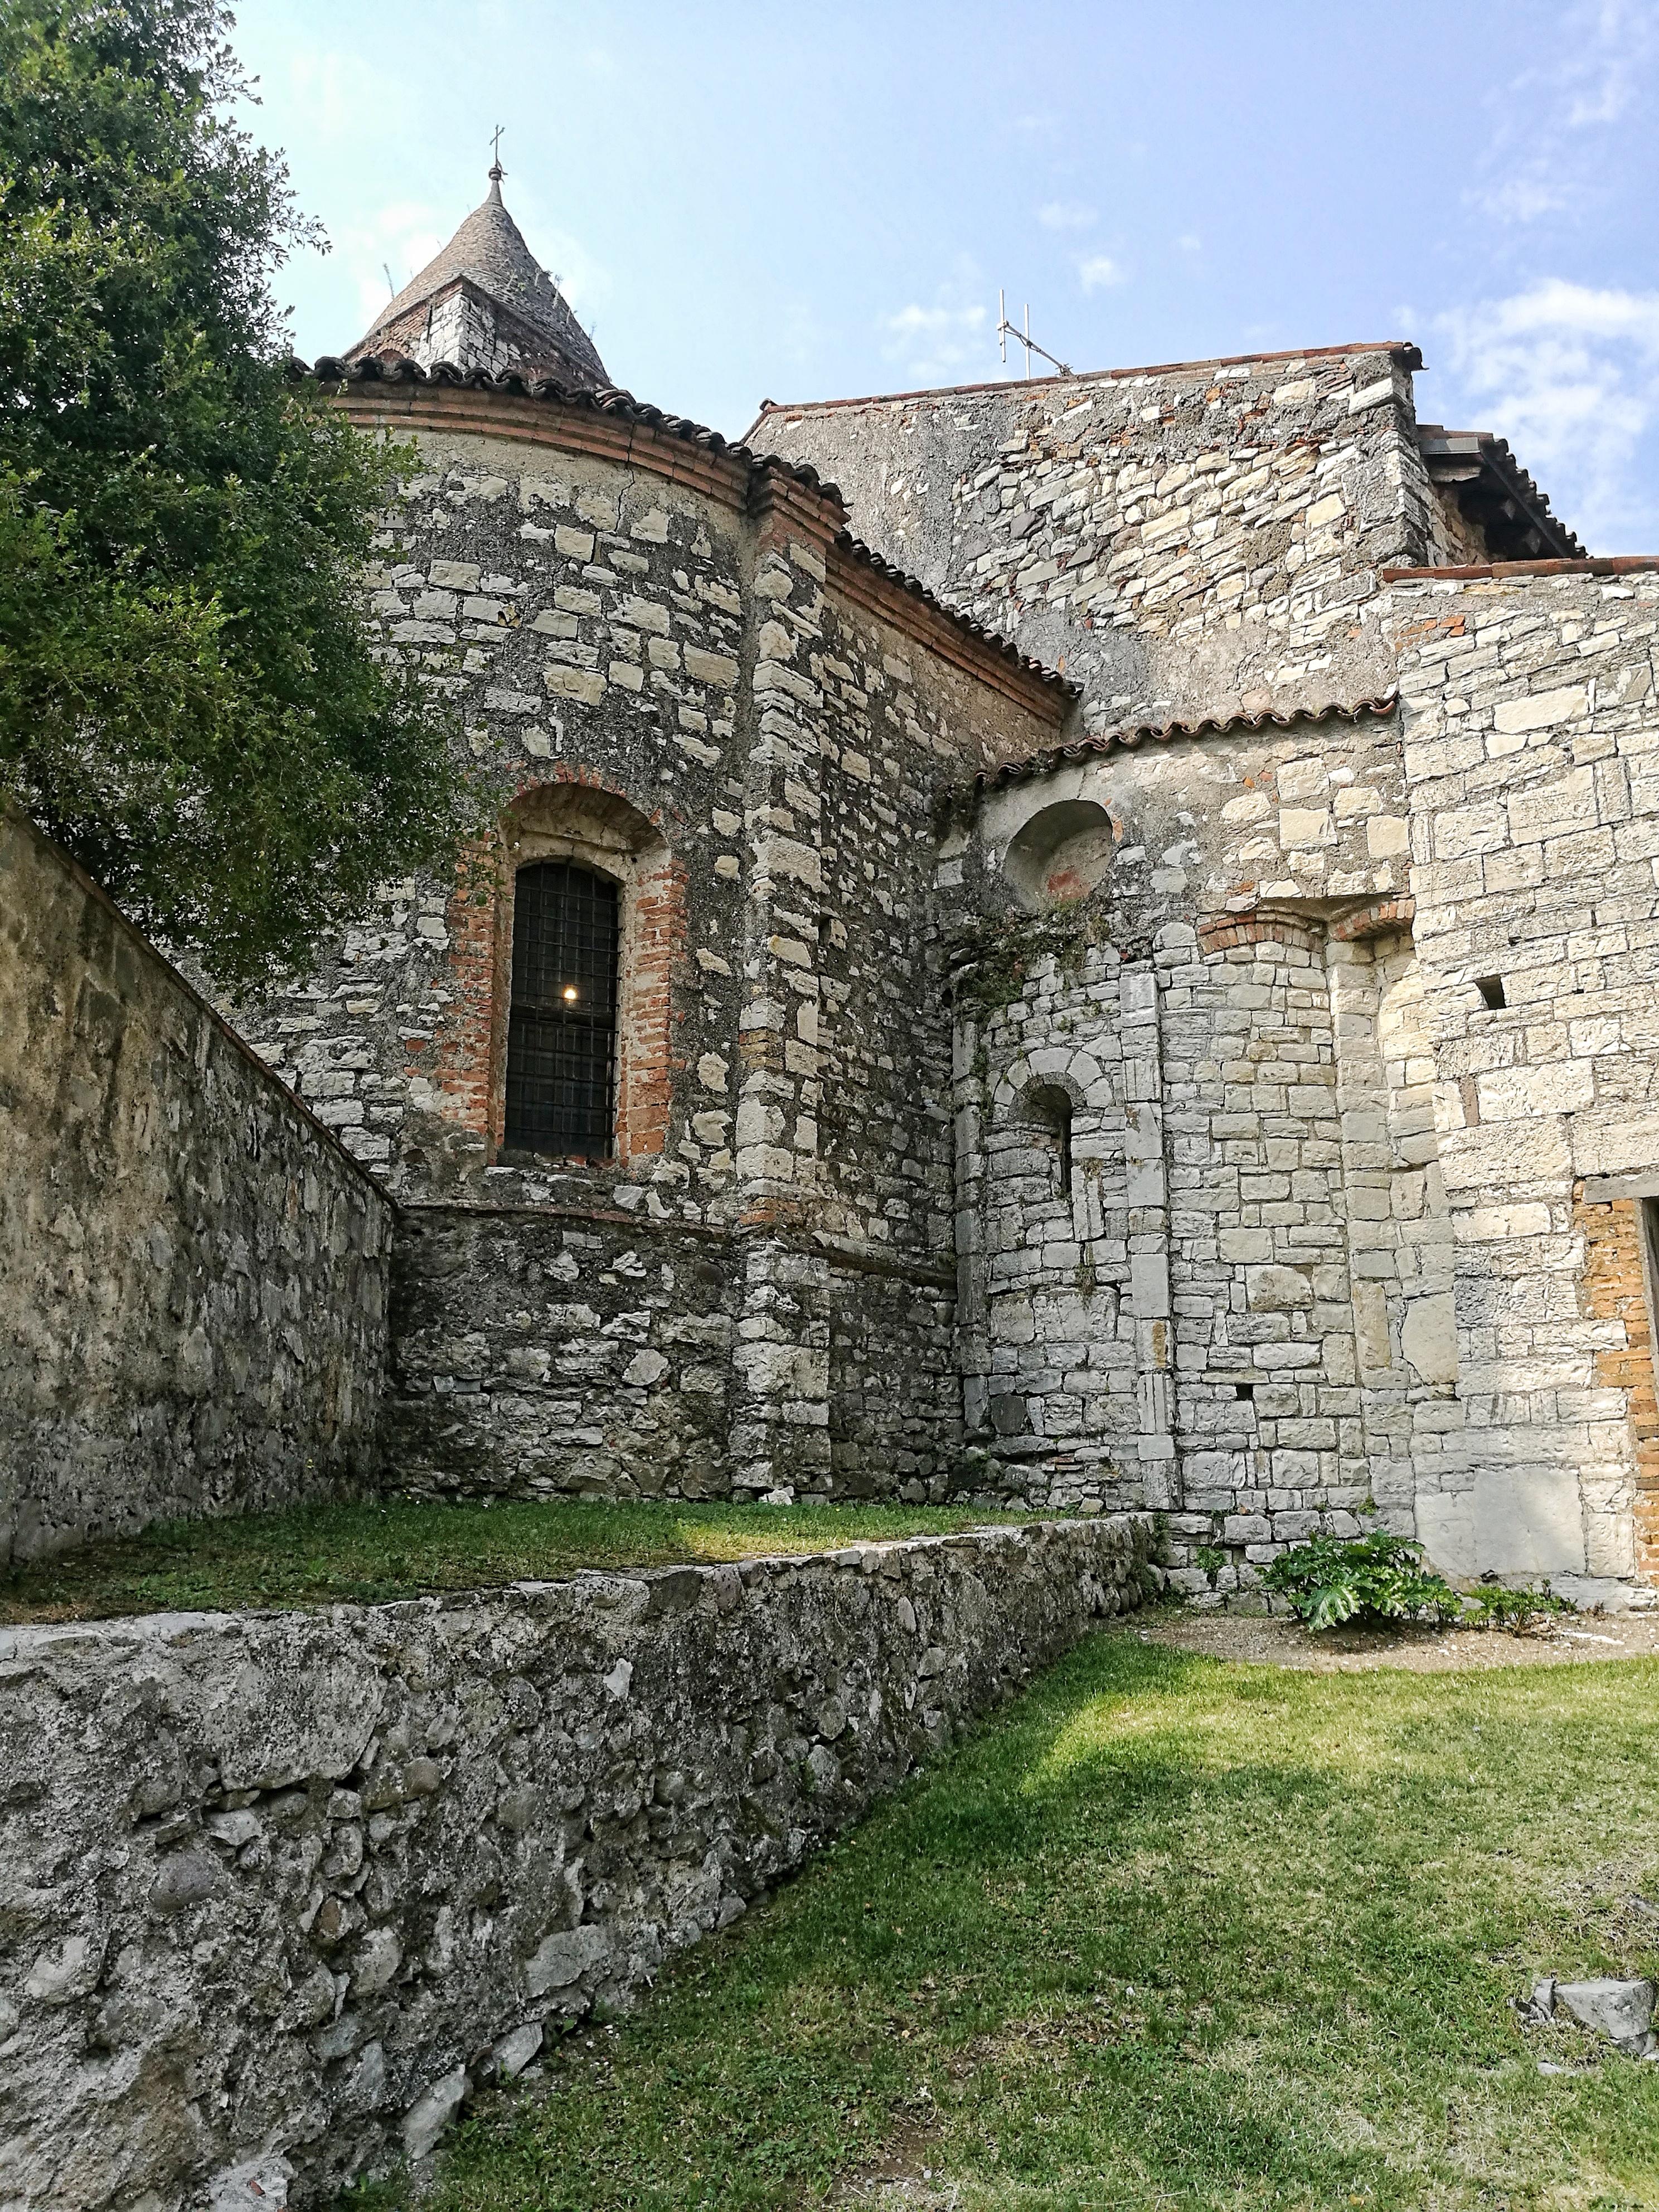 Monasteri in Franciacorta